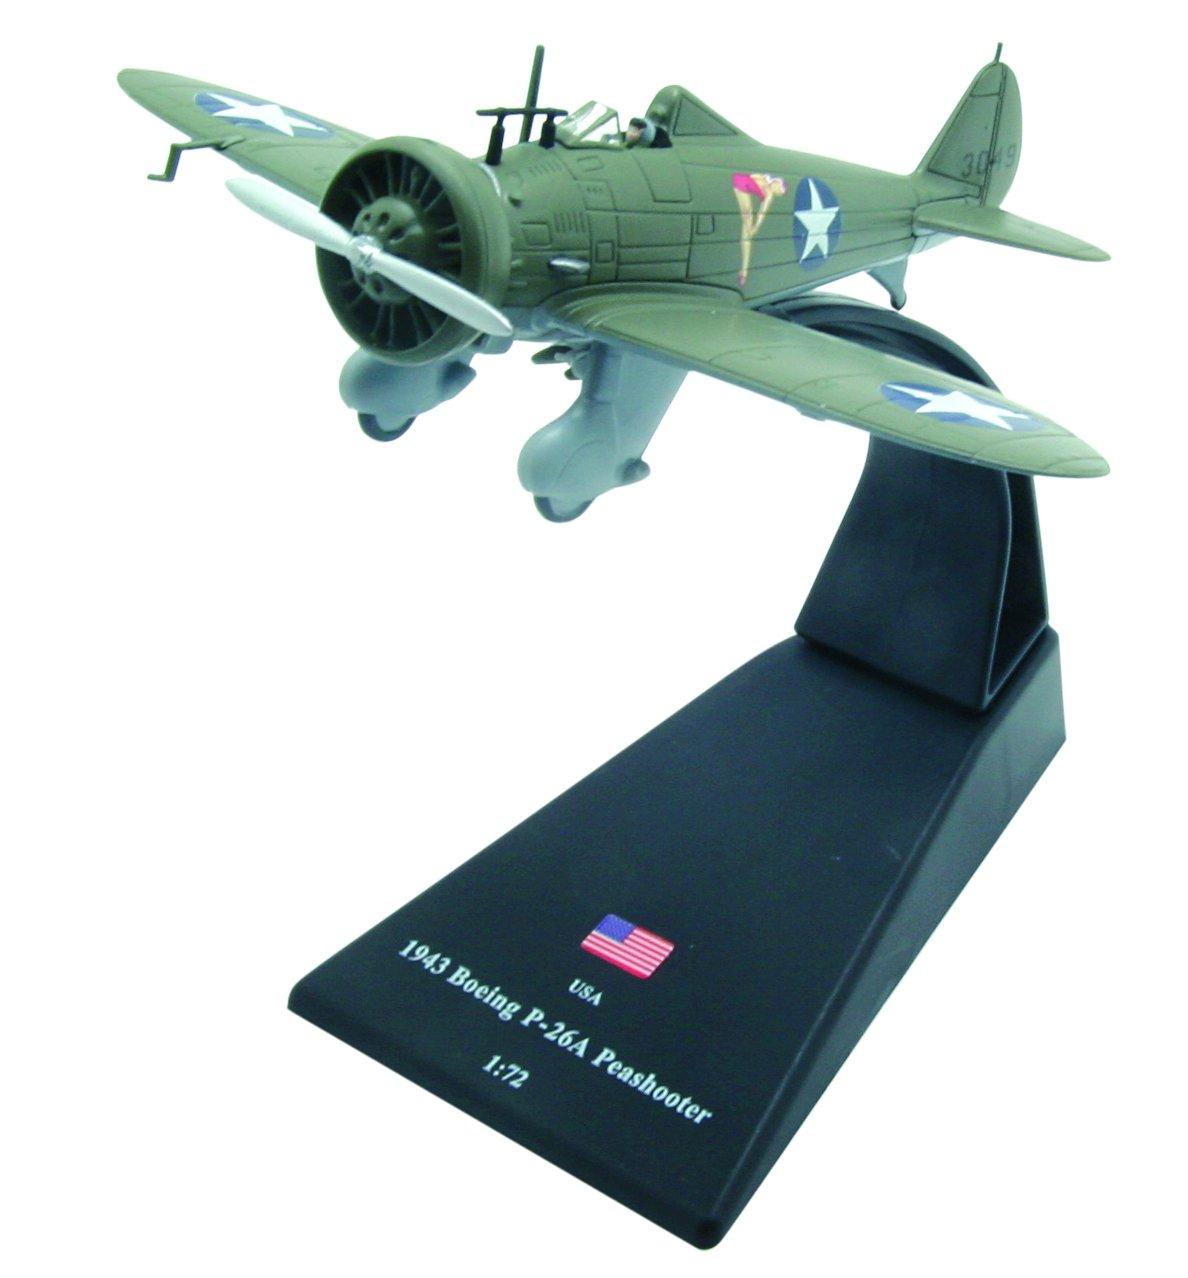 Boeing P-26A Peashooter diecast 1:72 fighter model Amercom SL-49